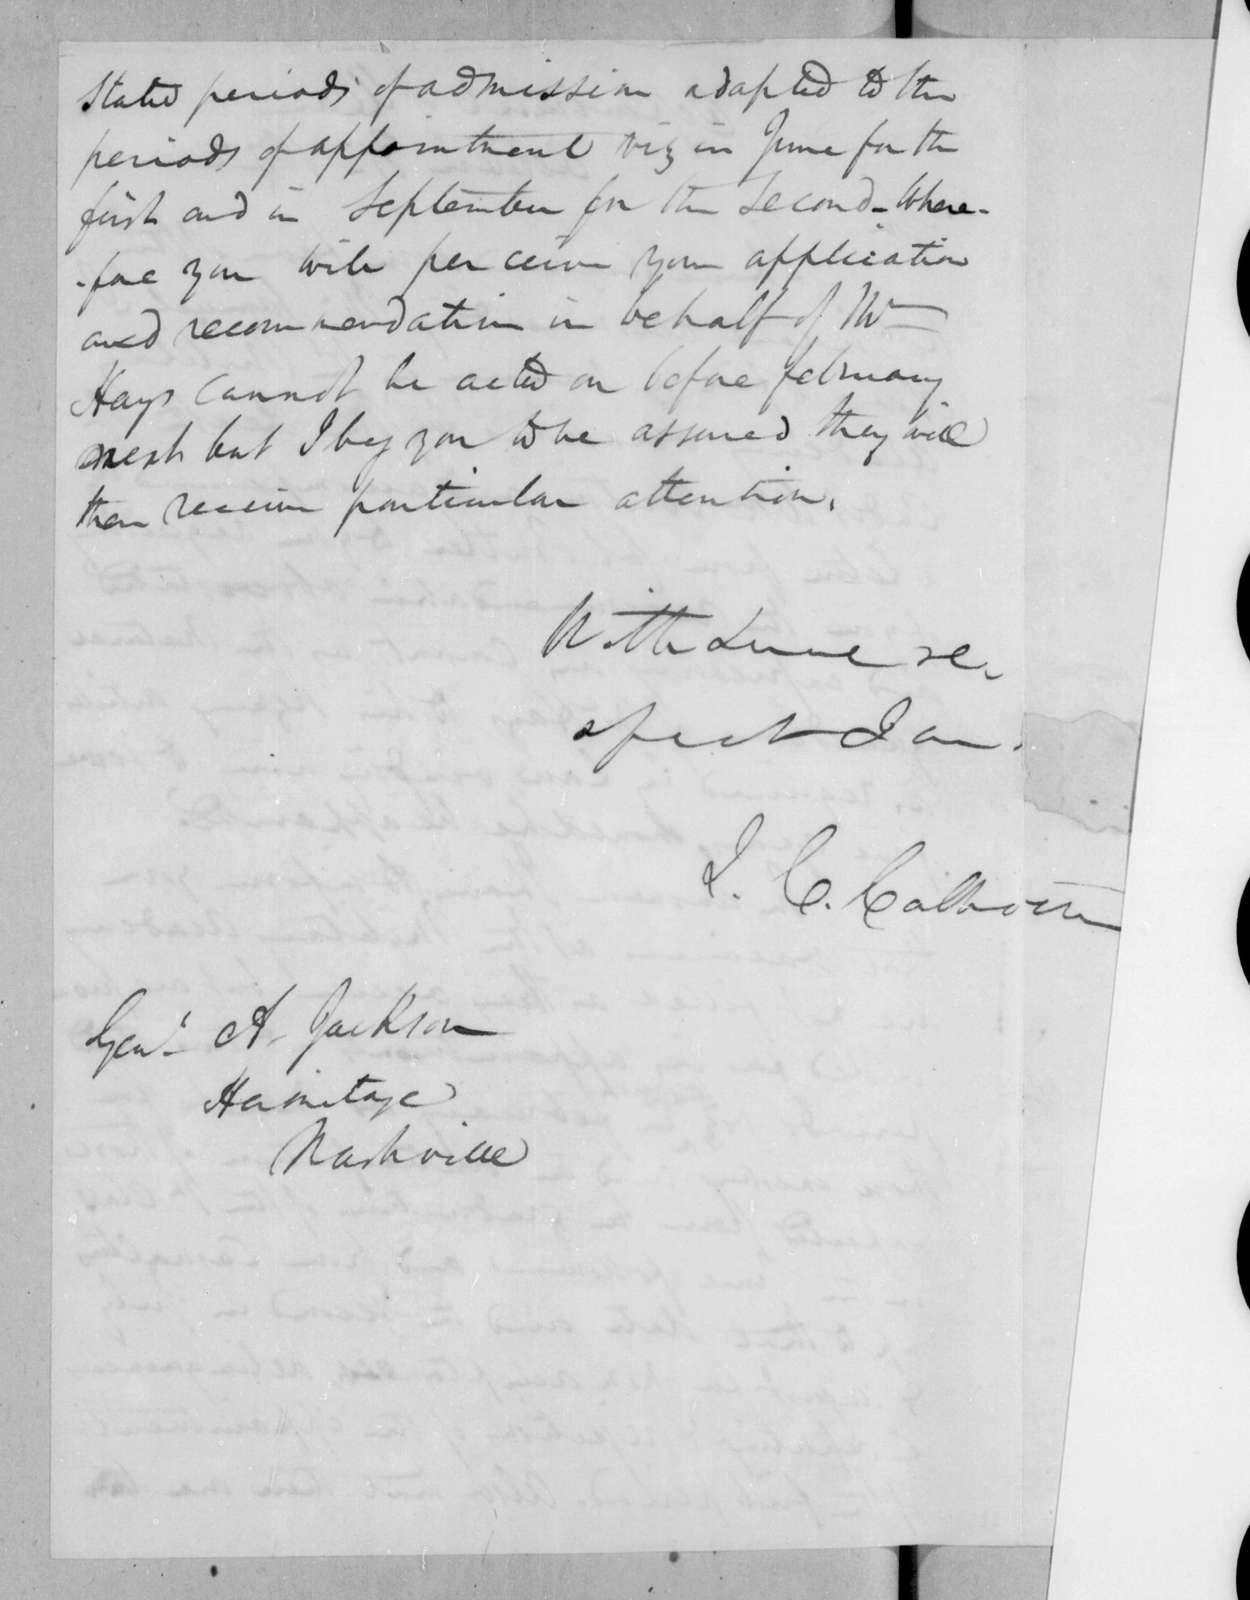 John Caldwell Calhoun to Andrew Jackson, October 31, 1822